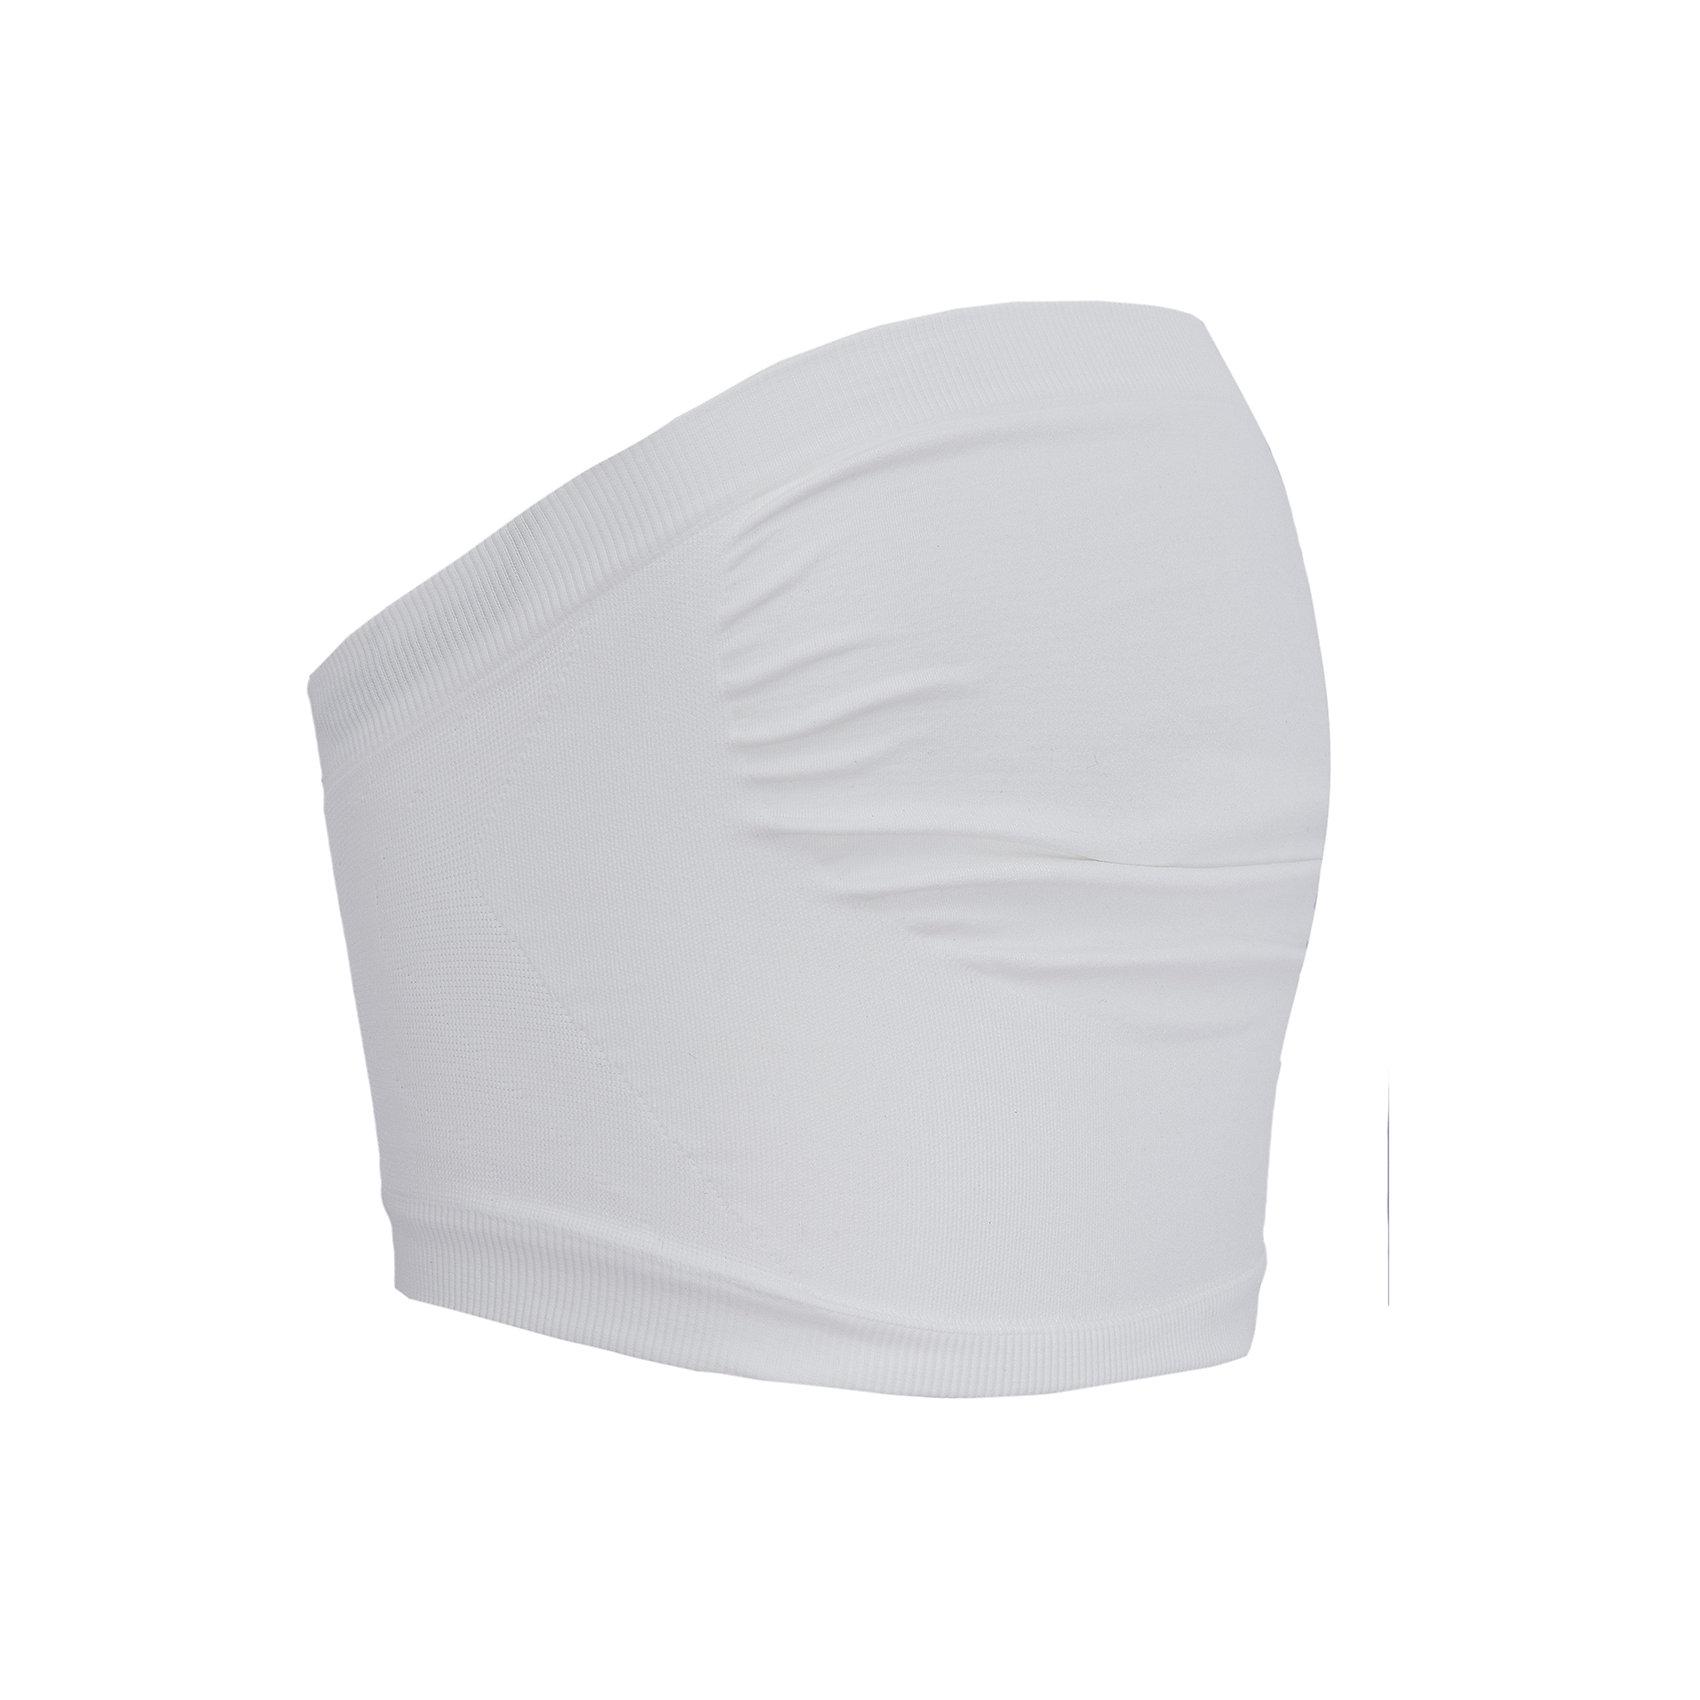 Medela Бандаж для беременных Medela carriwell бандаж бесшовный для беременных корсет белый l